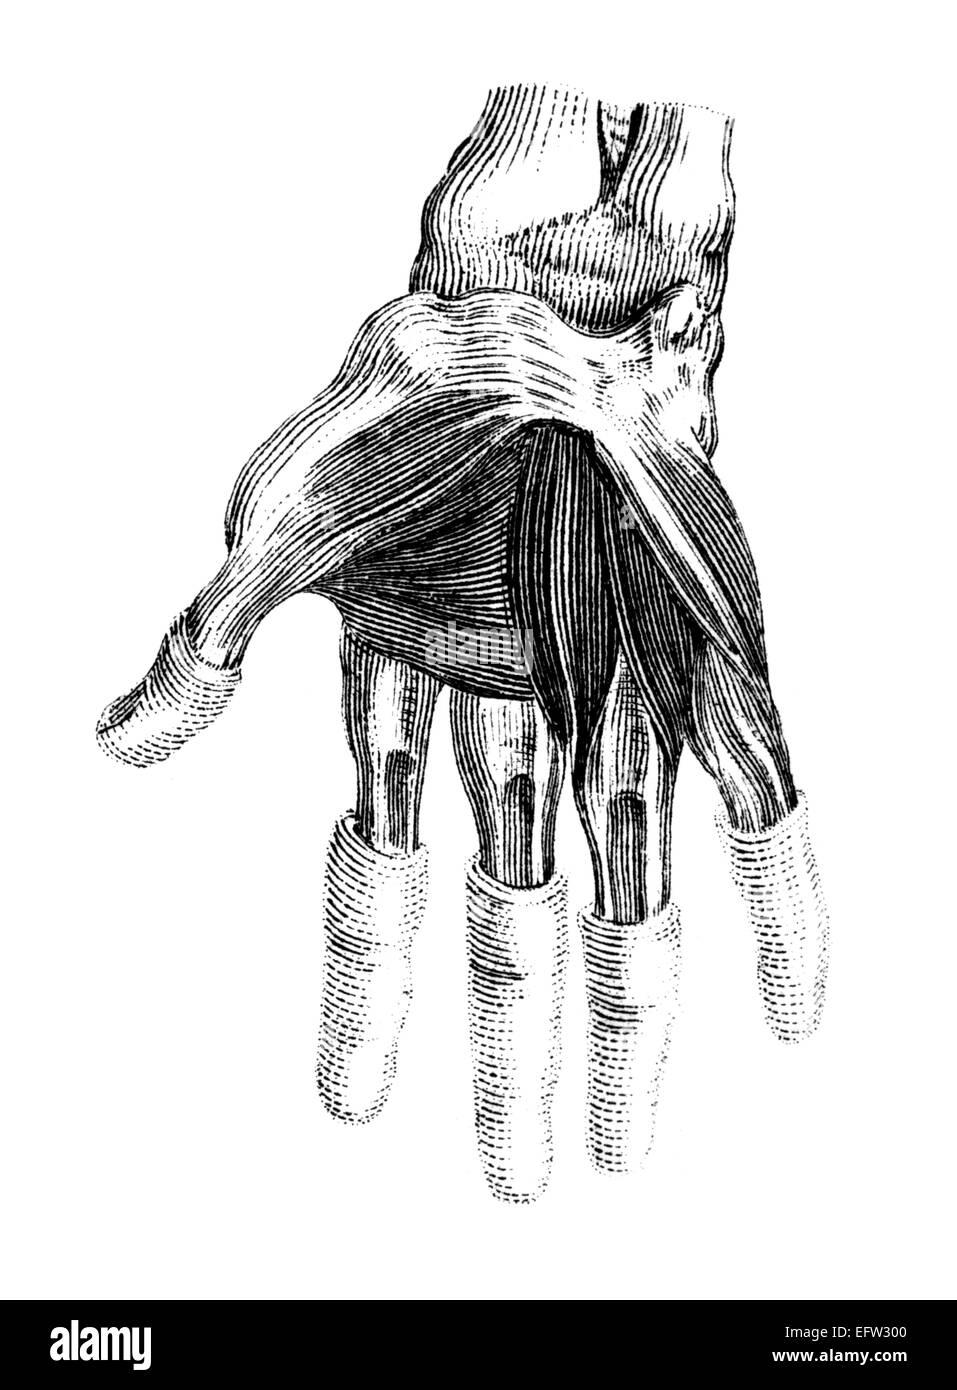 Vintage Engraving Anatomy Human Hand Stock Photos Vintage